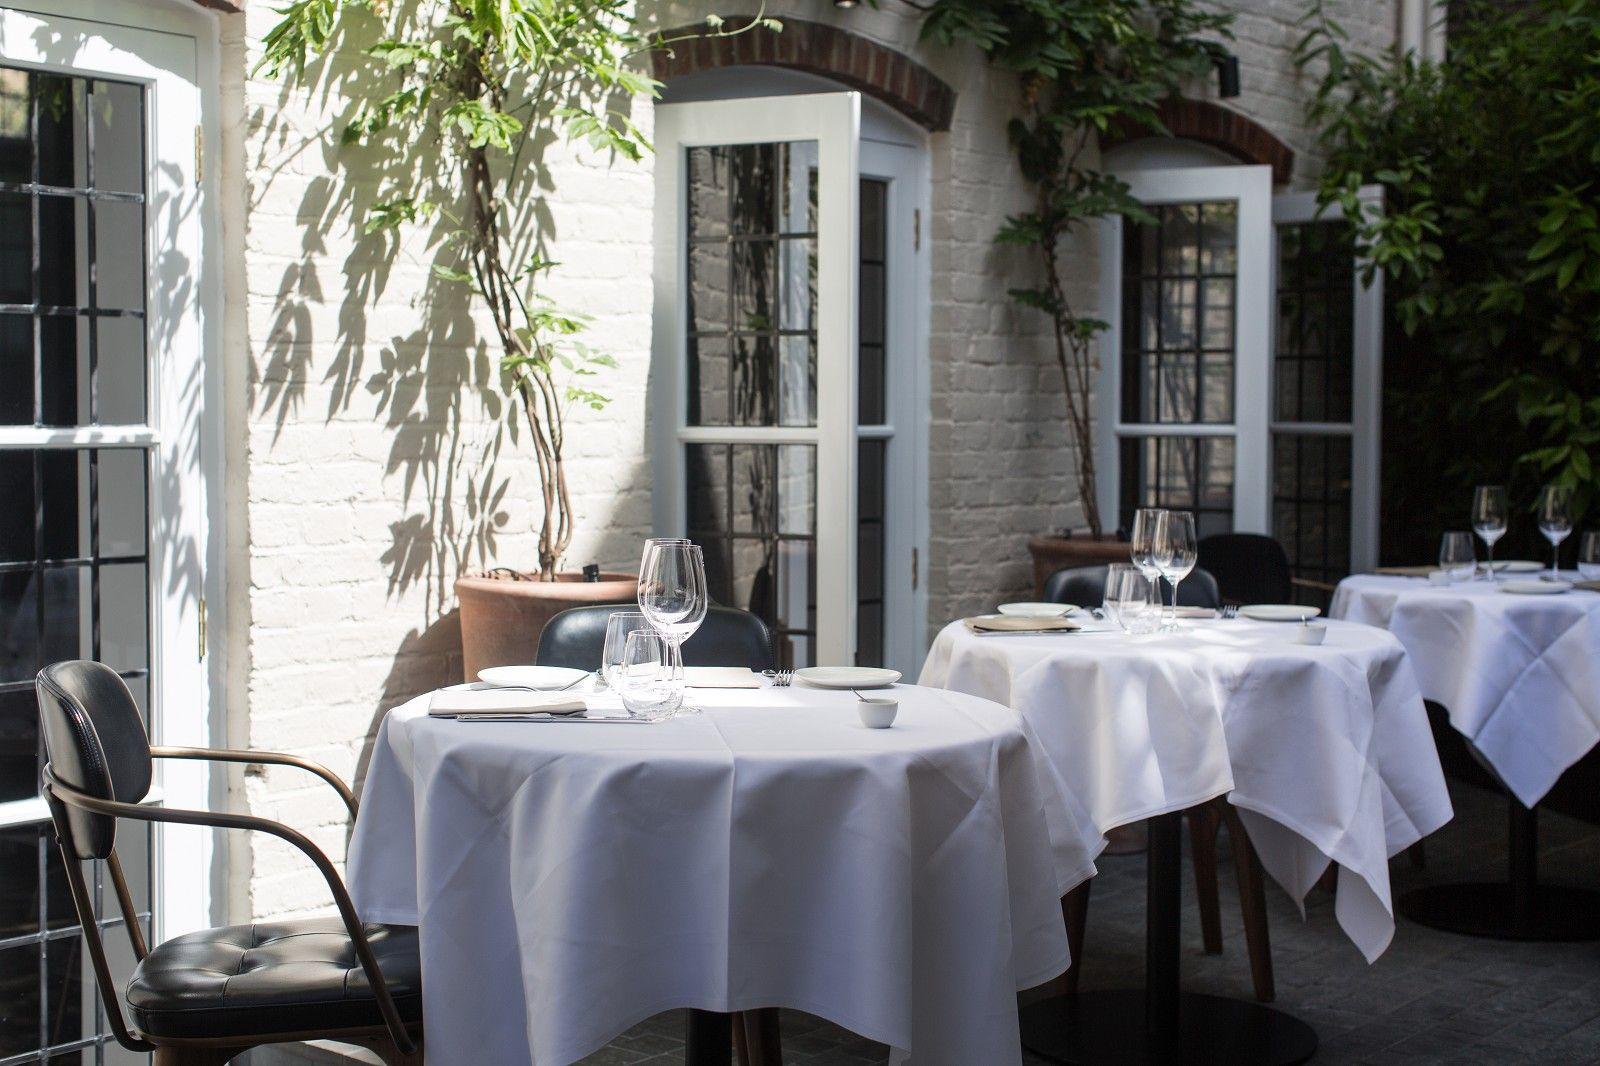 Garden and home zambia  Totous  Lennox Garden Mews  Mon projet de restaurant à